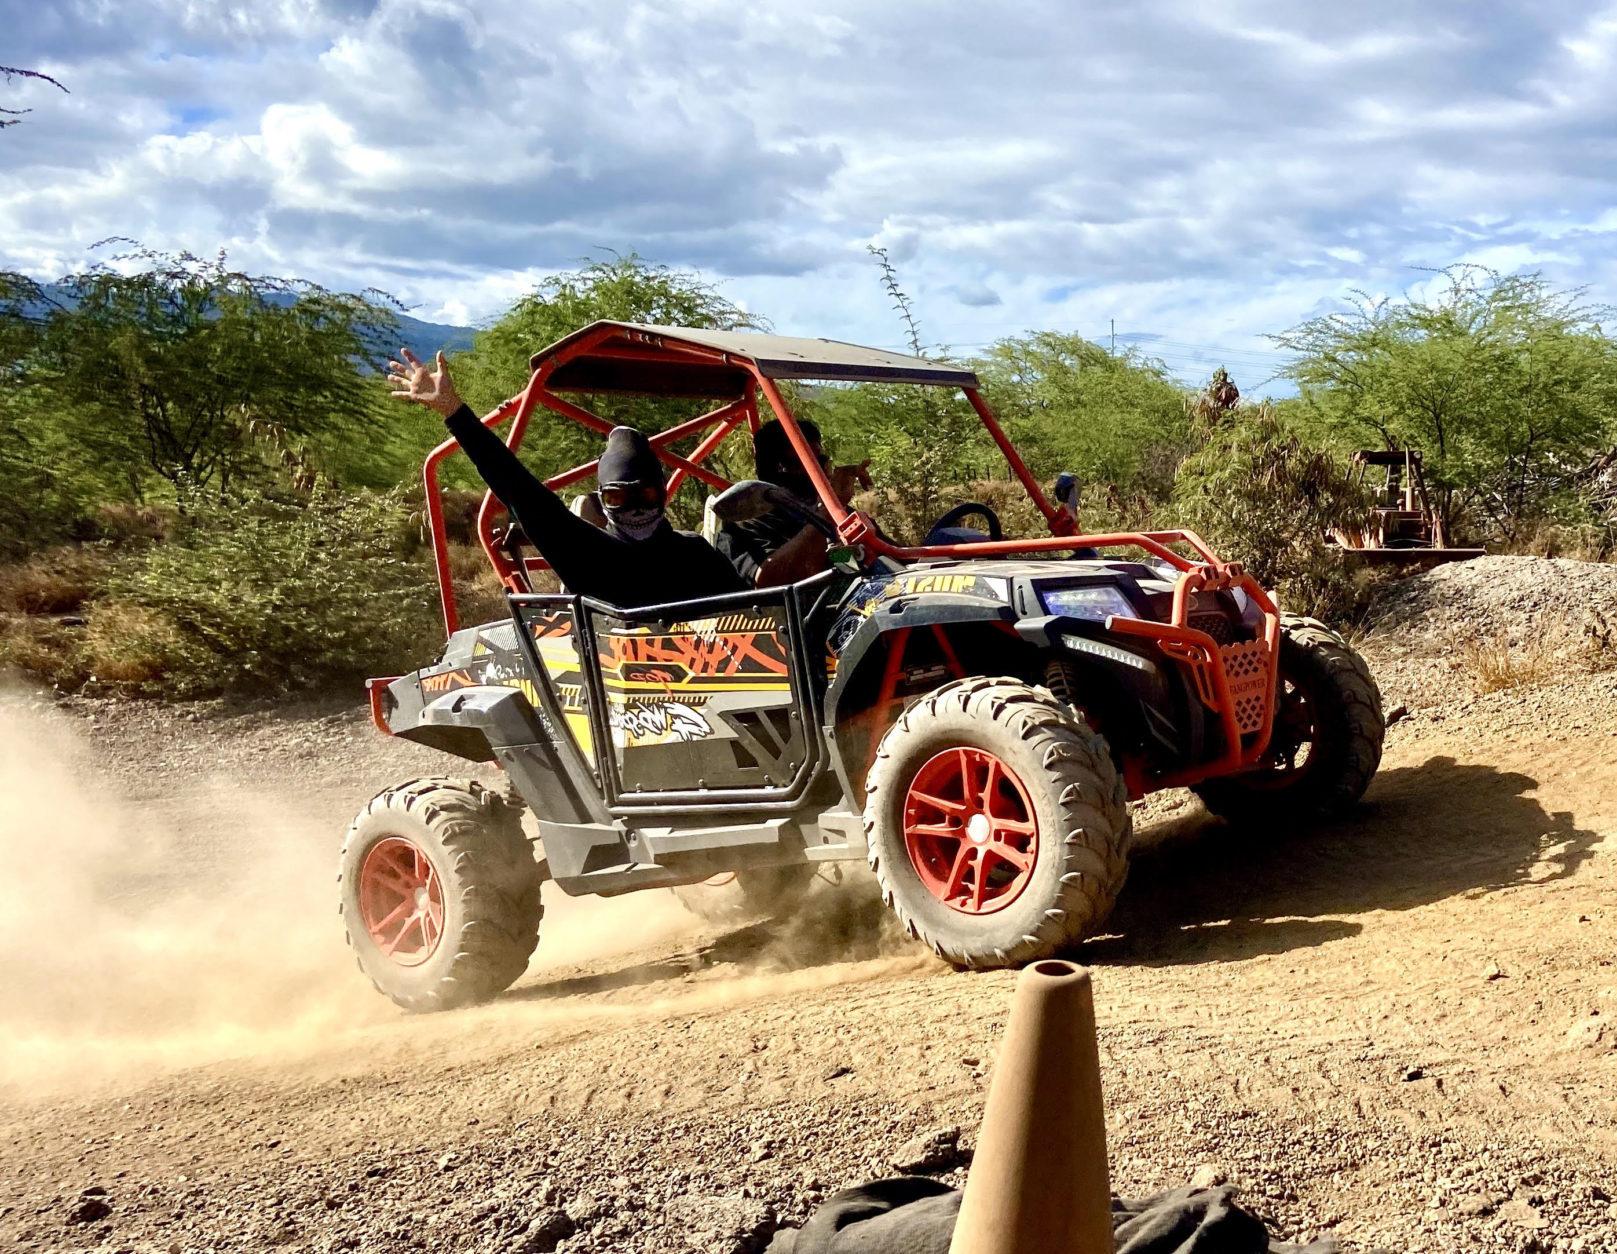 Hawaii ATV Off-Road Adventure Tour in Honolulu